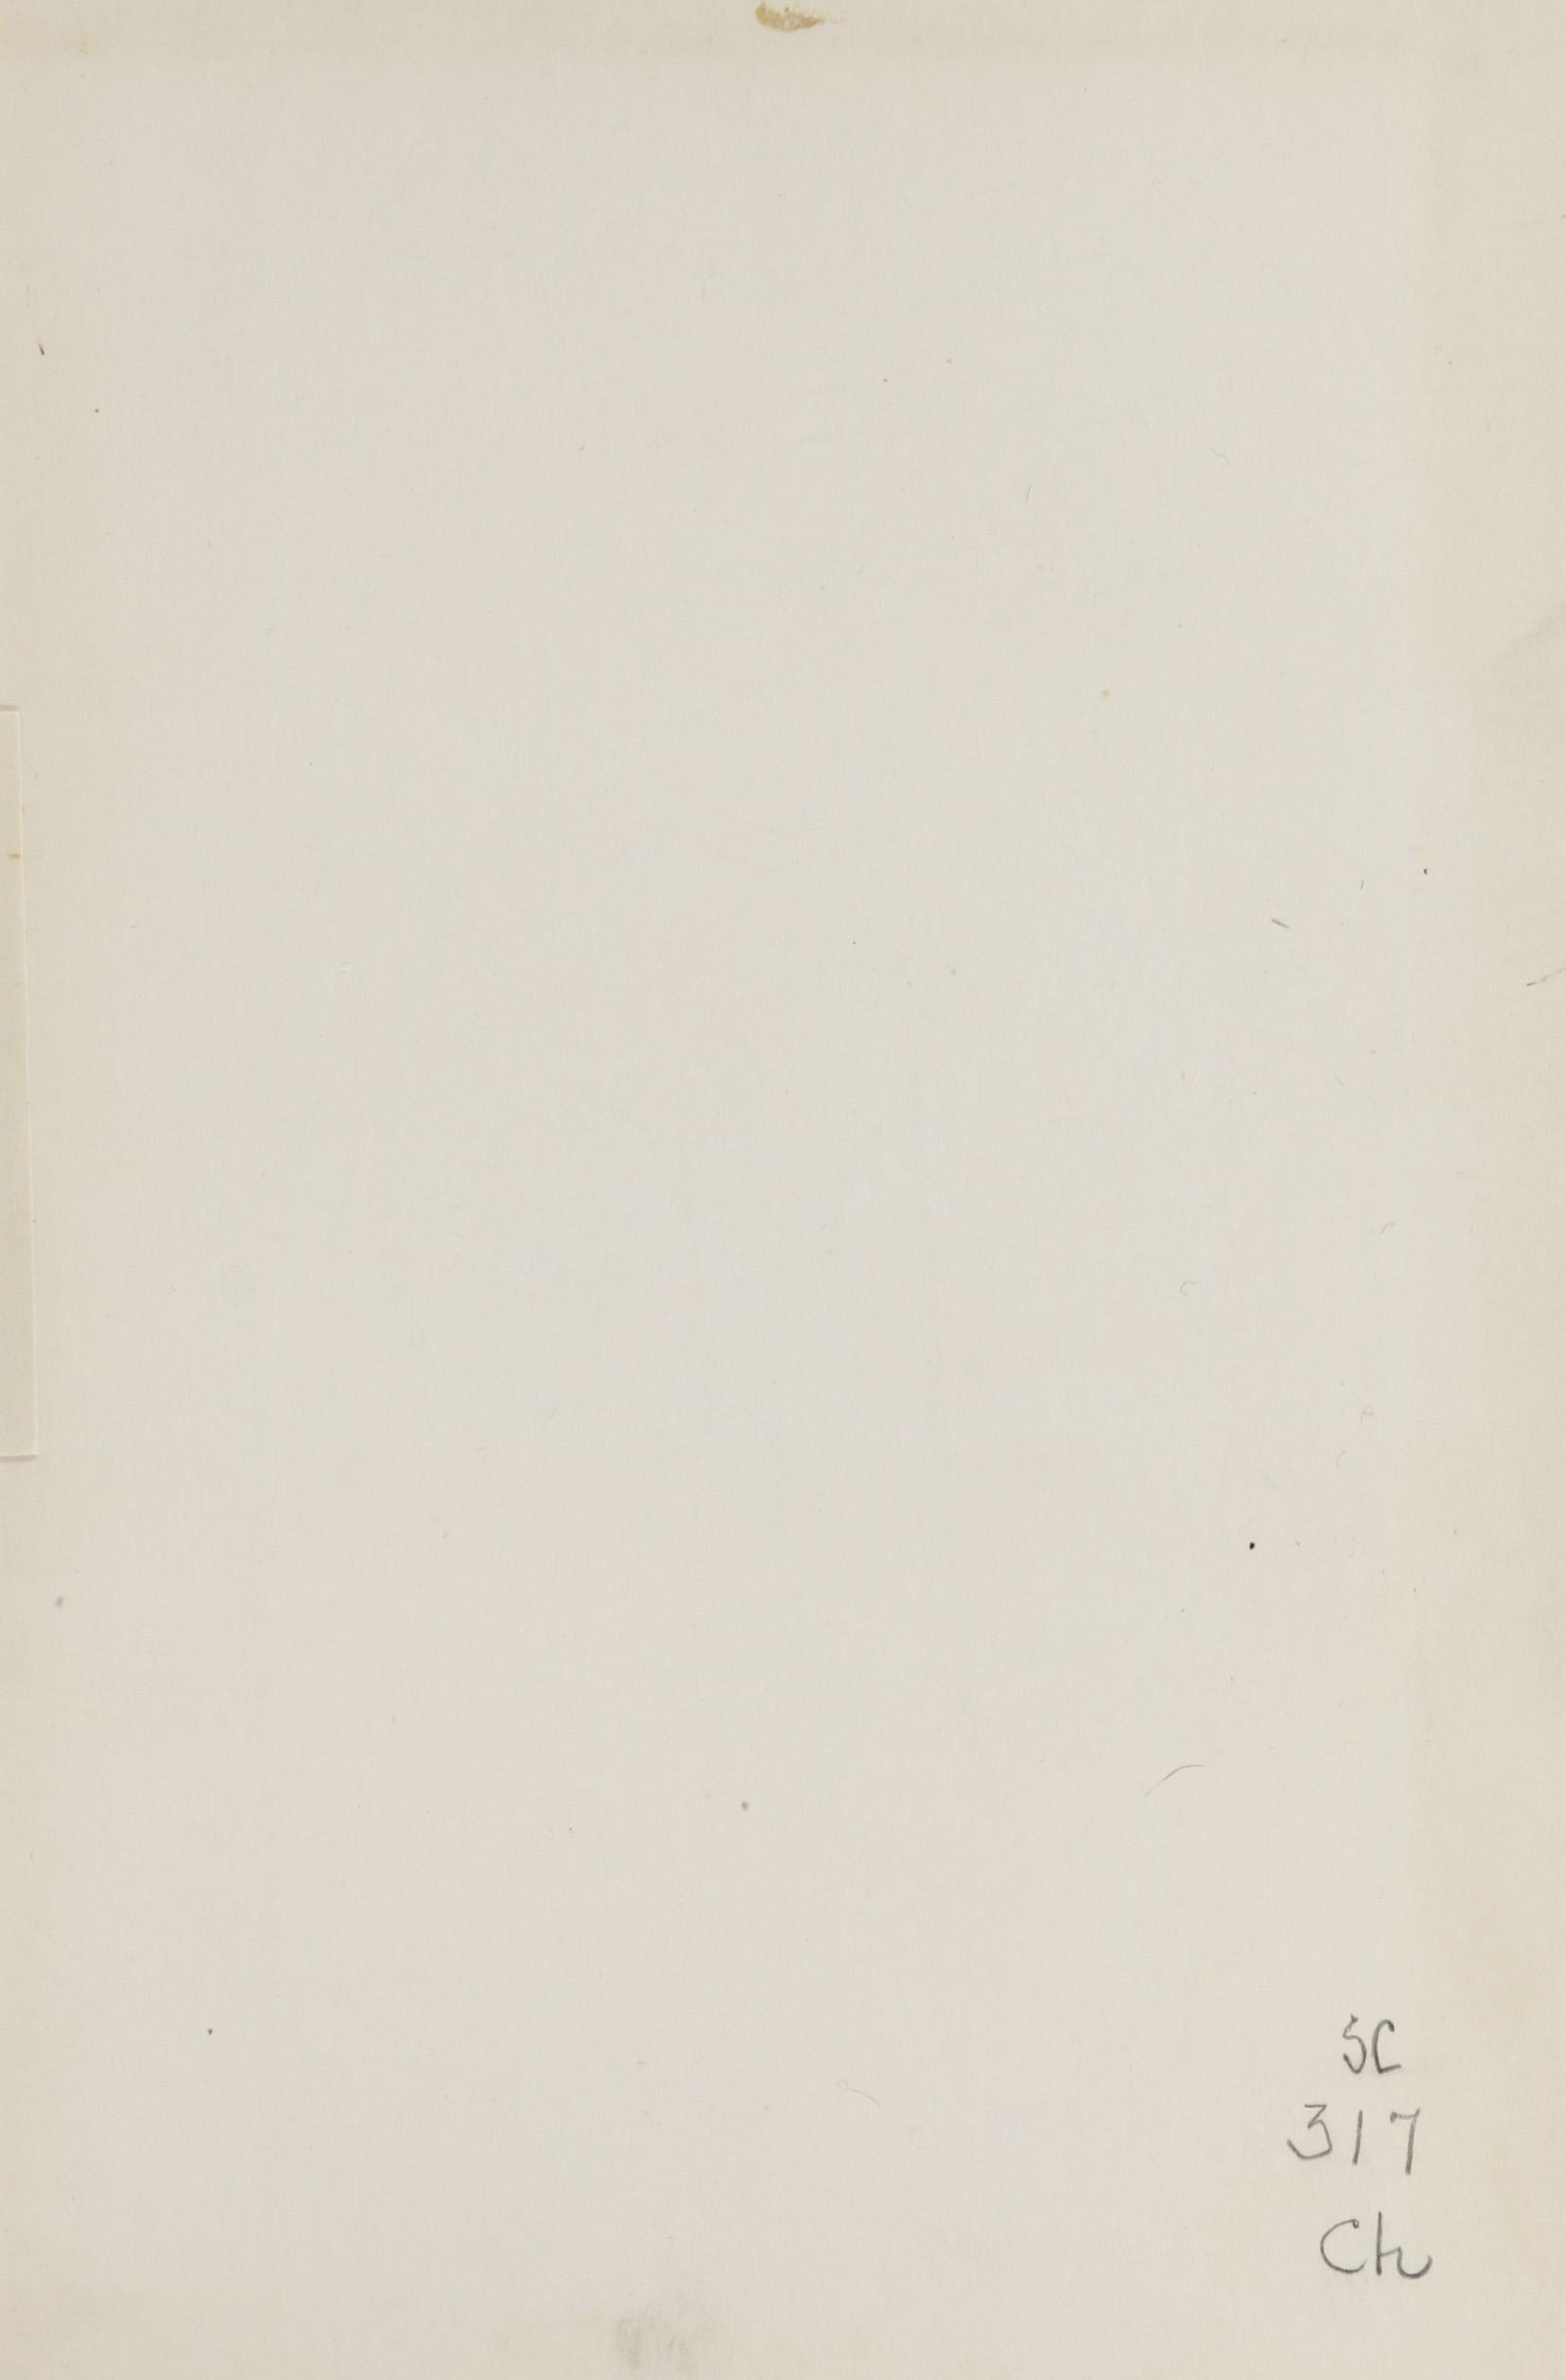 Charleston Yearbook, 1943, blank page. Handwritten note in lower corner,